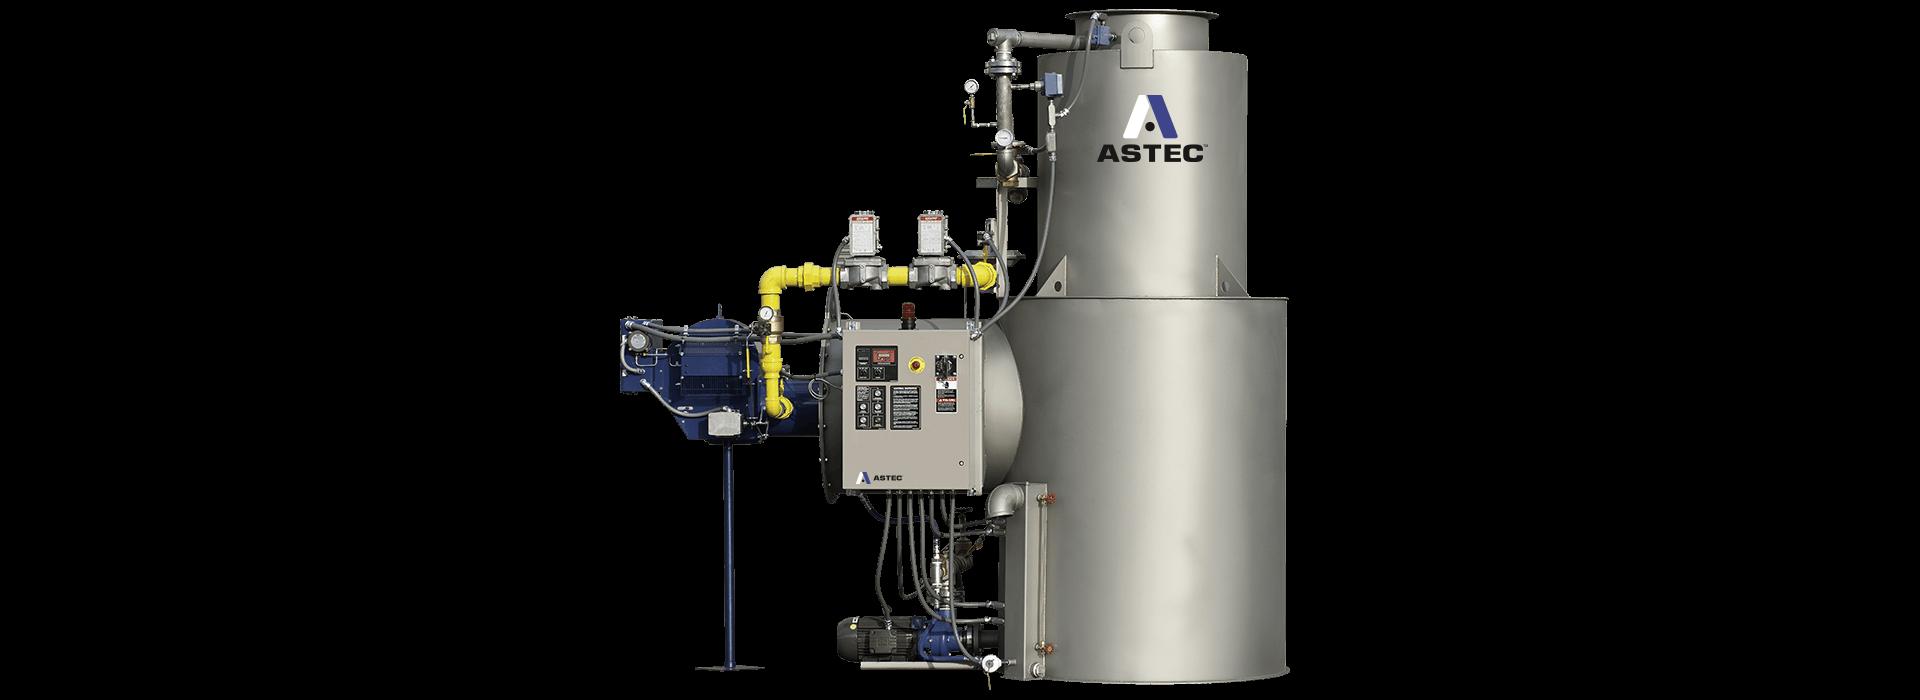 Heatec Firestorm Instantaneous Water Heater